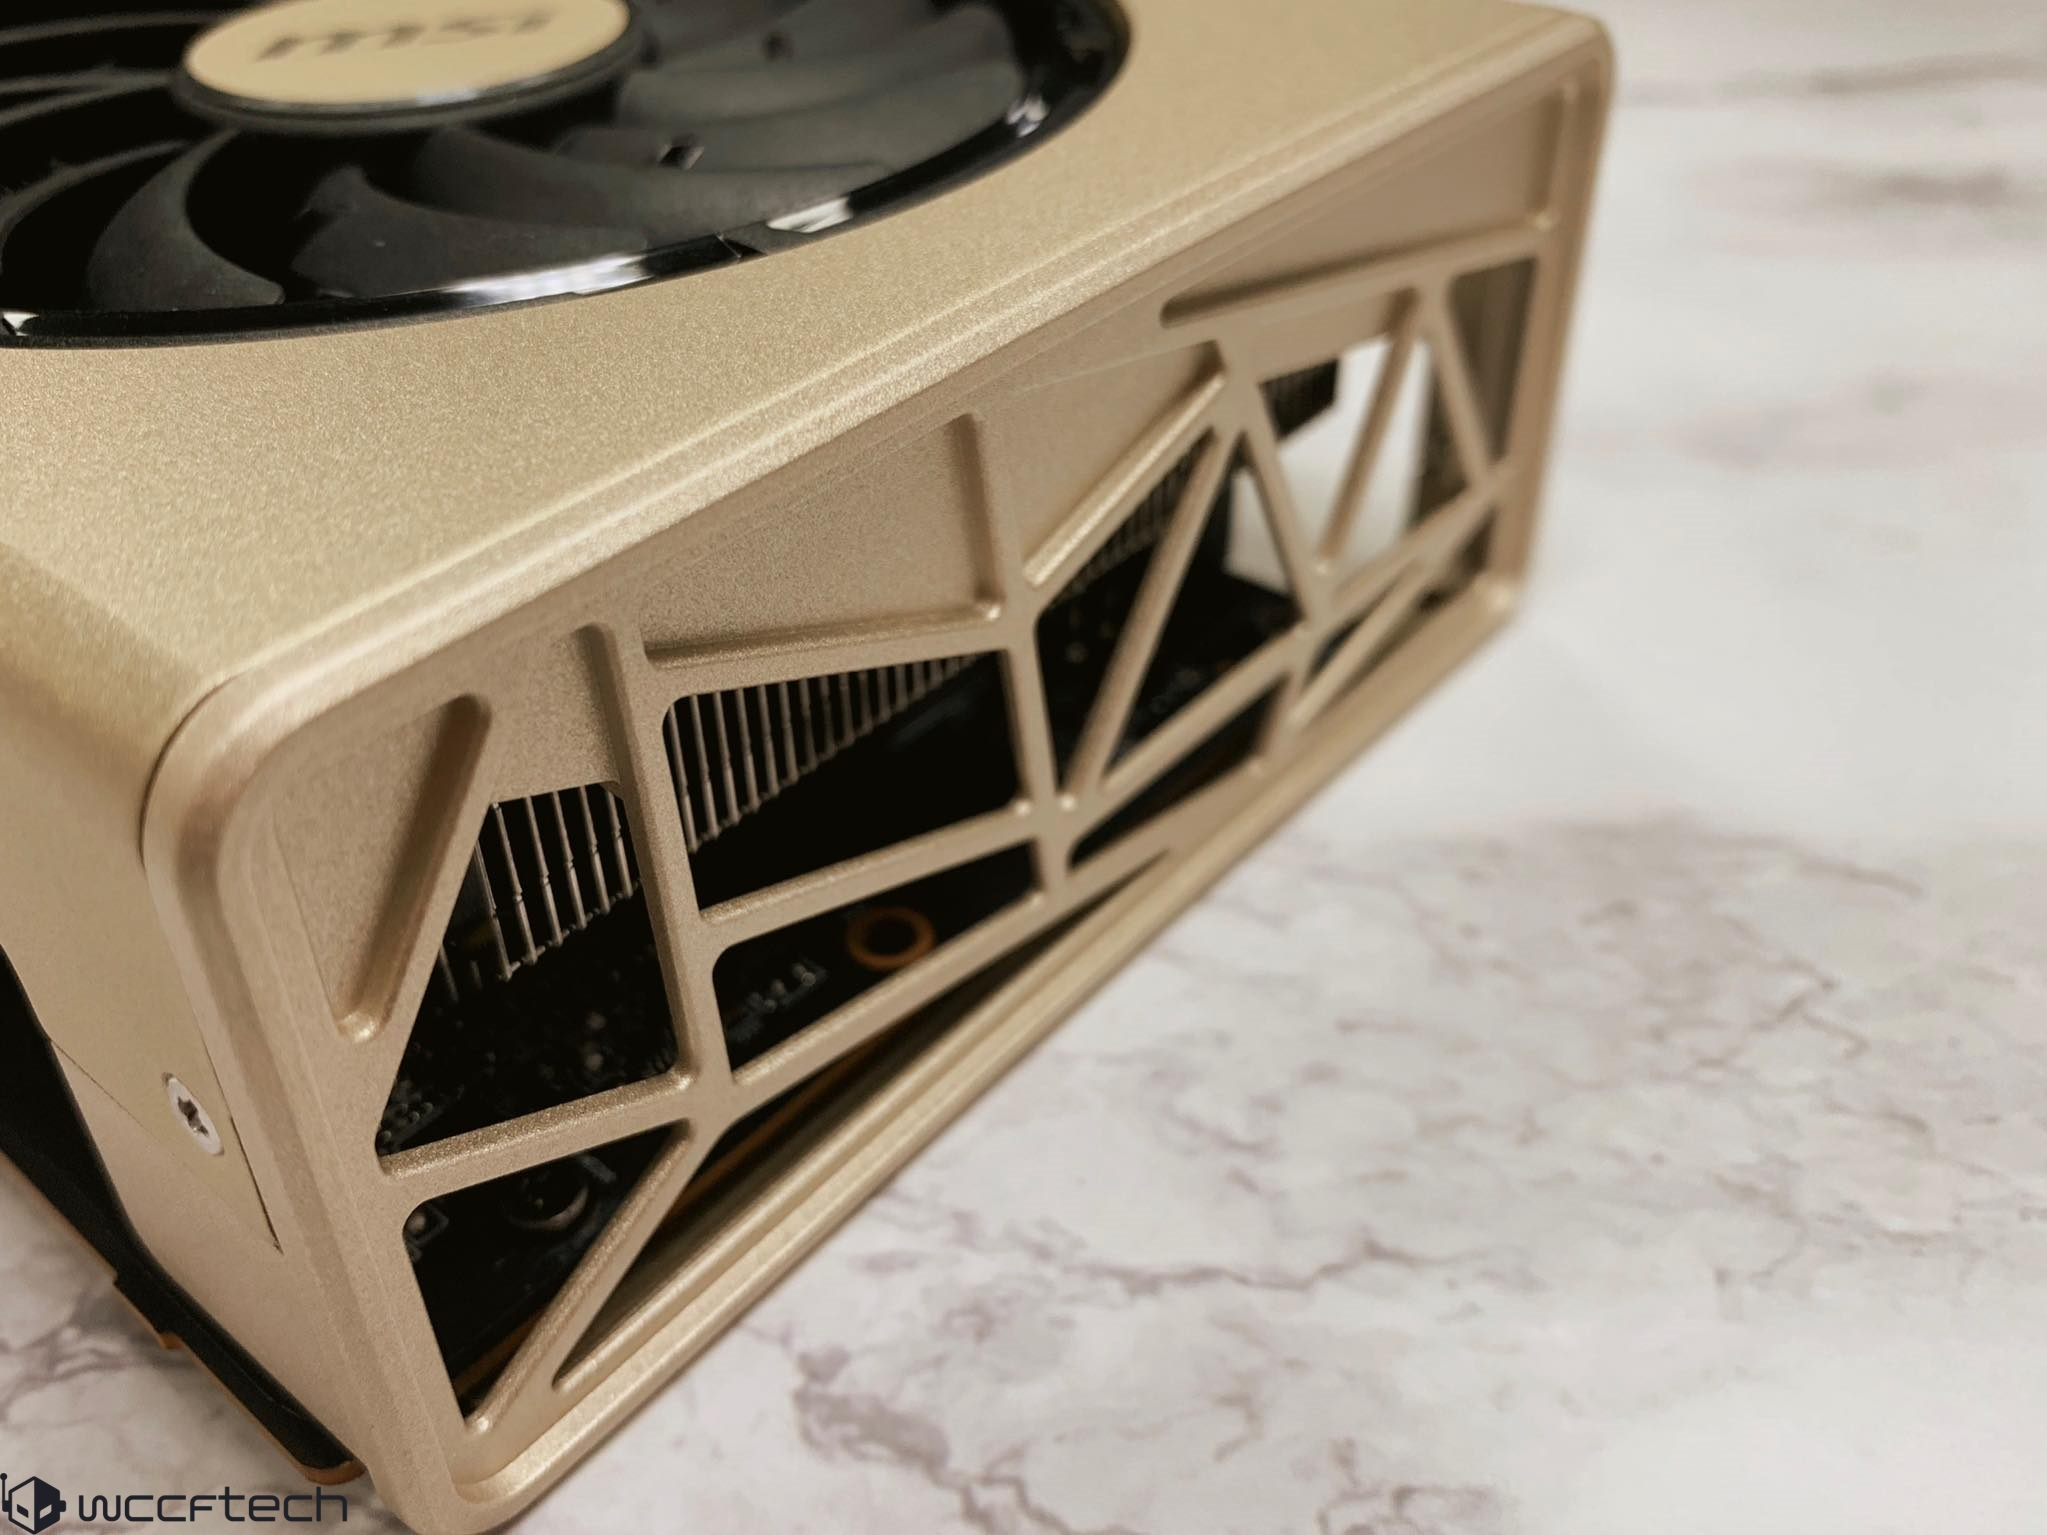 MSI Radeon RX 5700 XT EVOKE Custom Graphics Card Teased